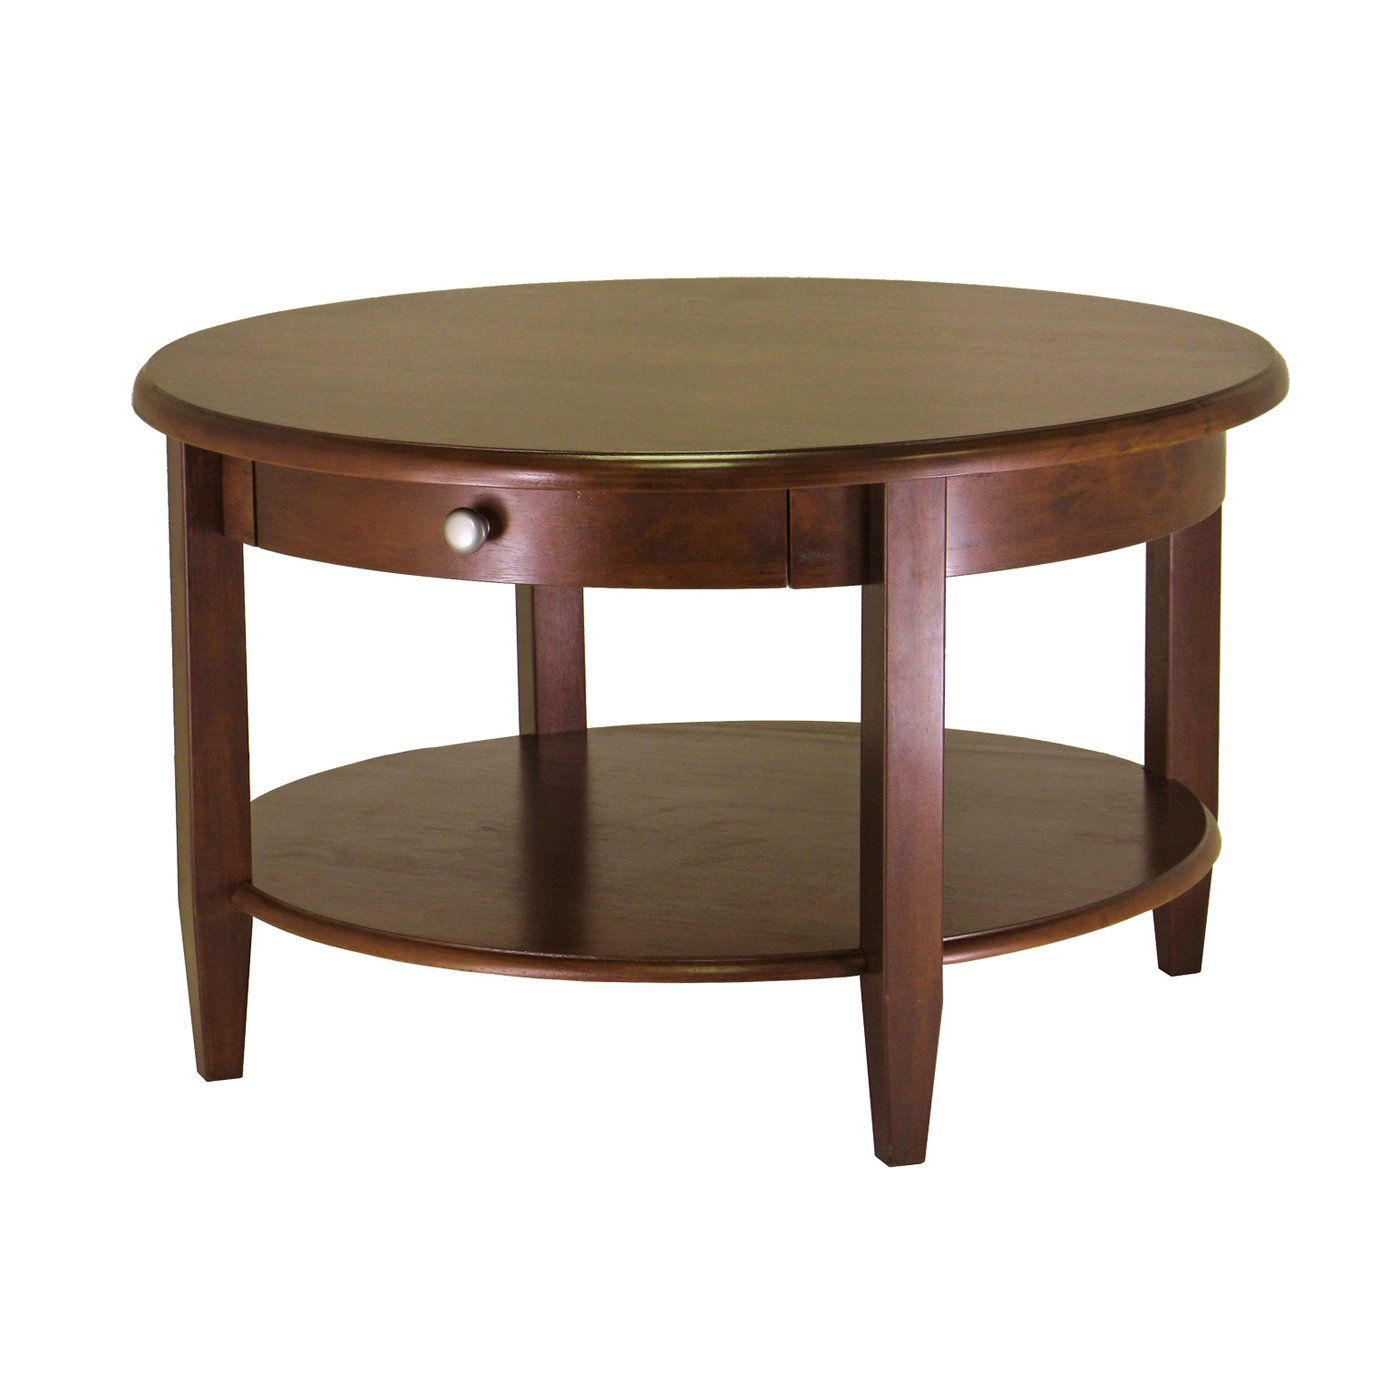 Fr Coffee Table Round Wood Coffee Table Coffee Table Wood Coffee Table [ 1400 x 1400 Pixel ]